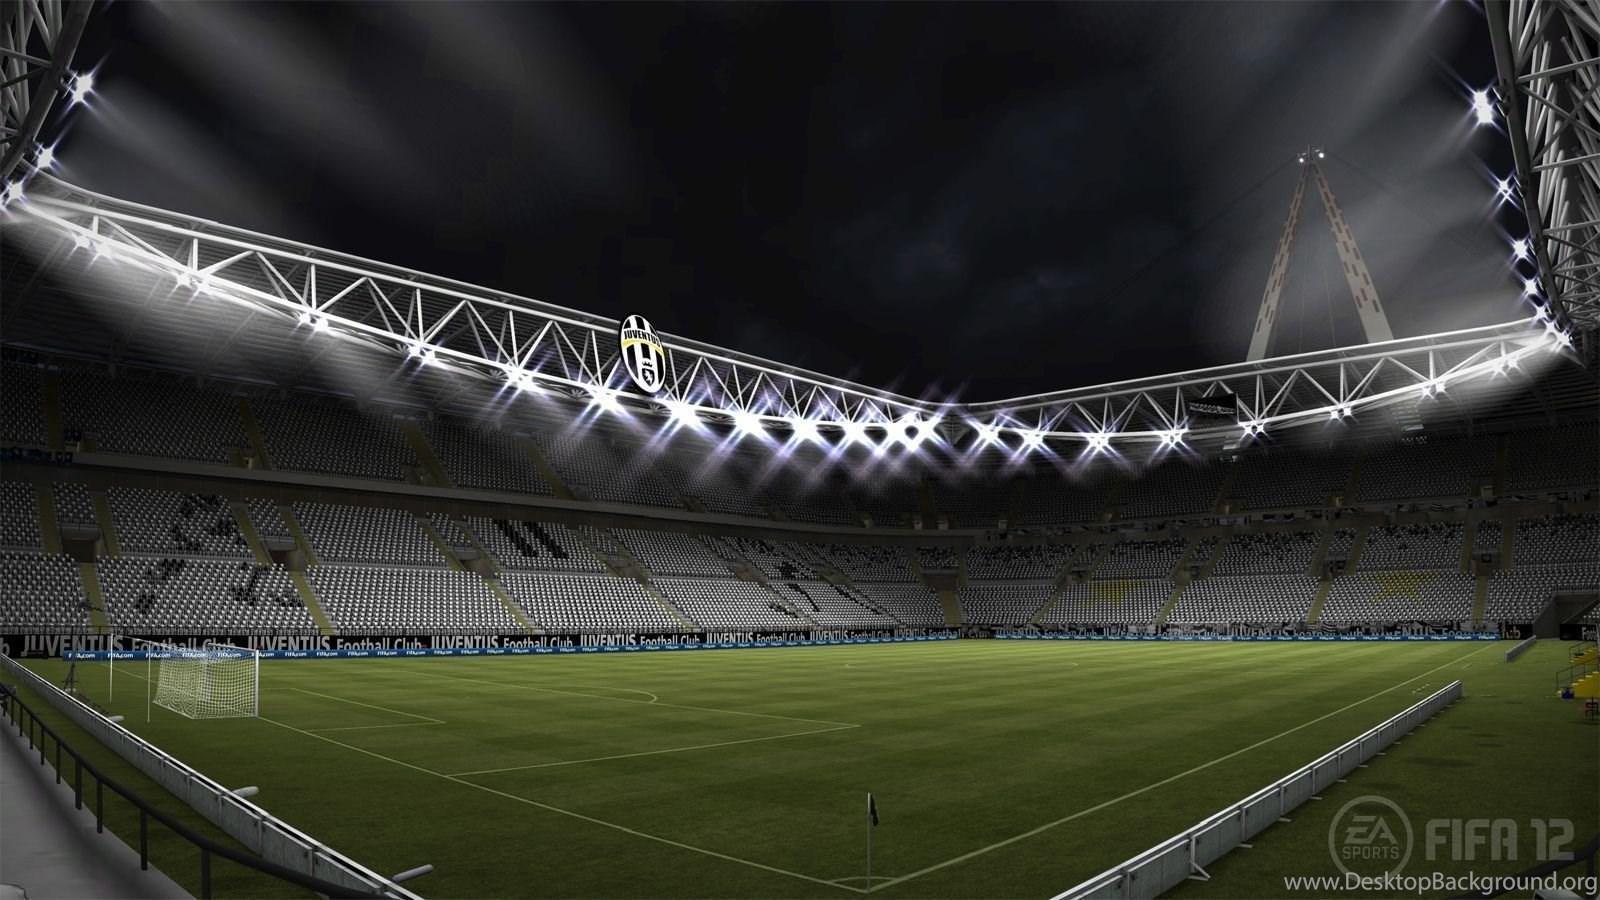 Hd juventus stadium wallpapers desktop background popular voltagebd Image collections